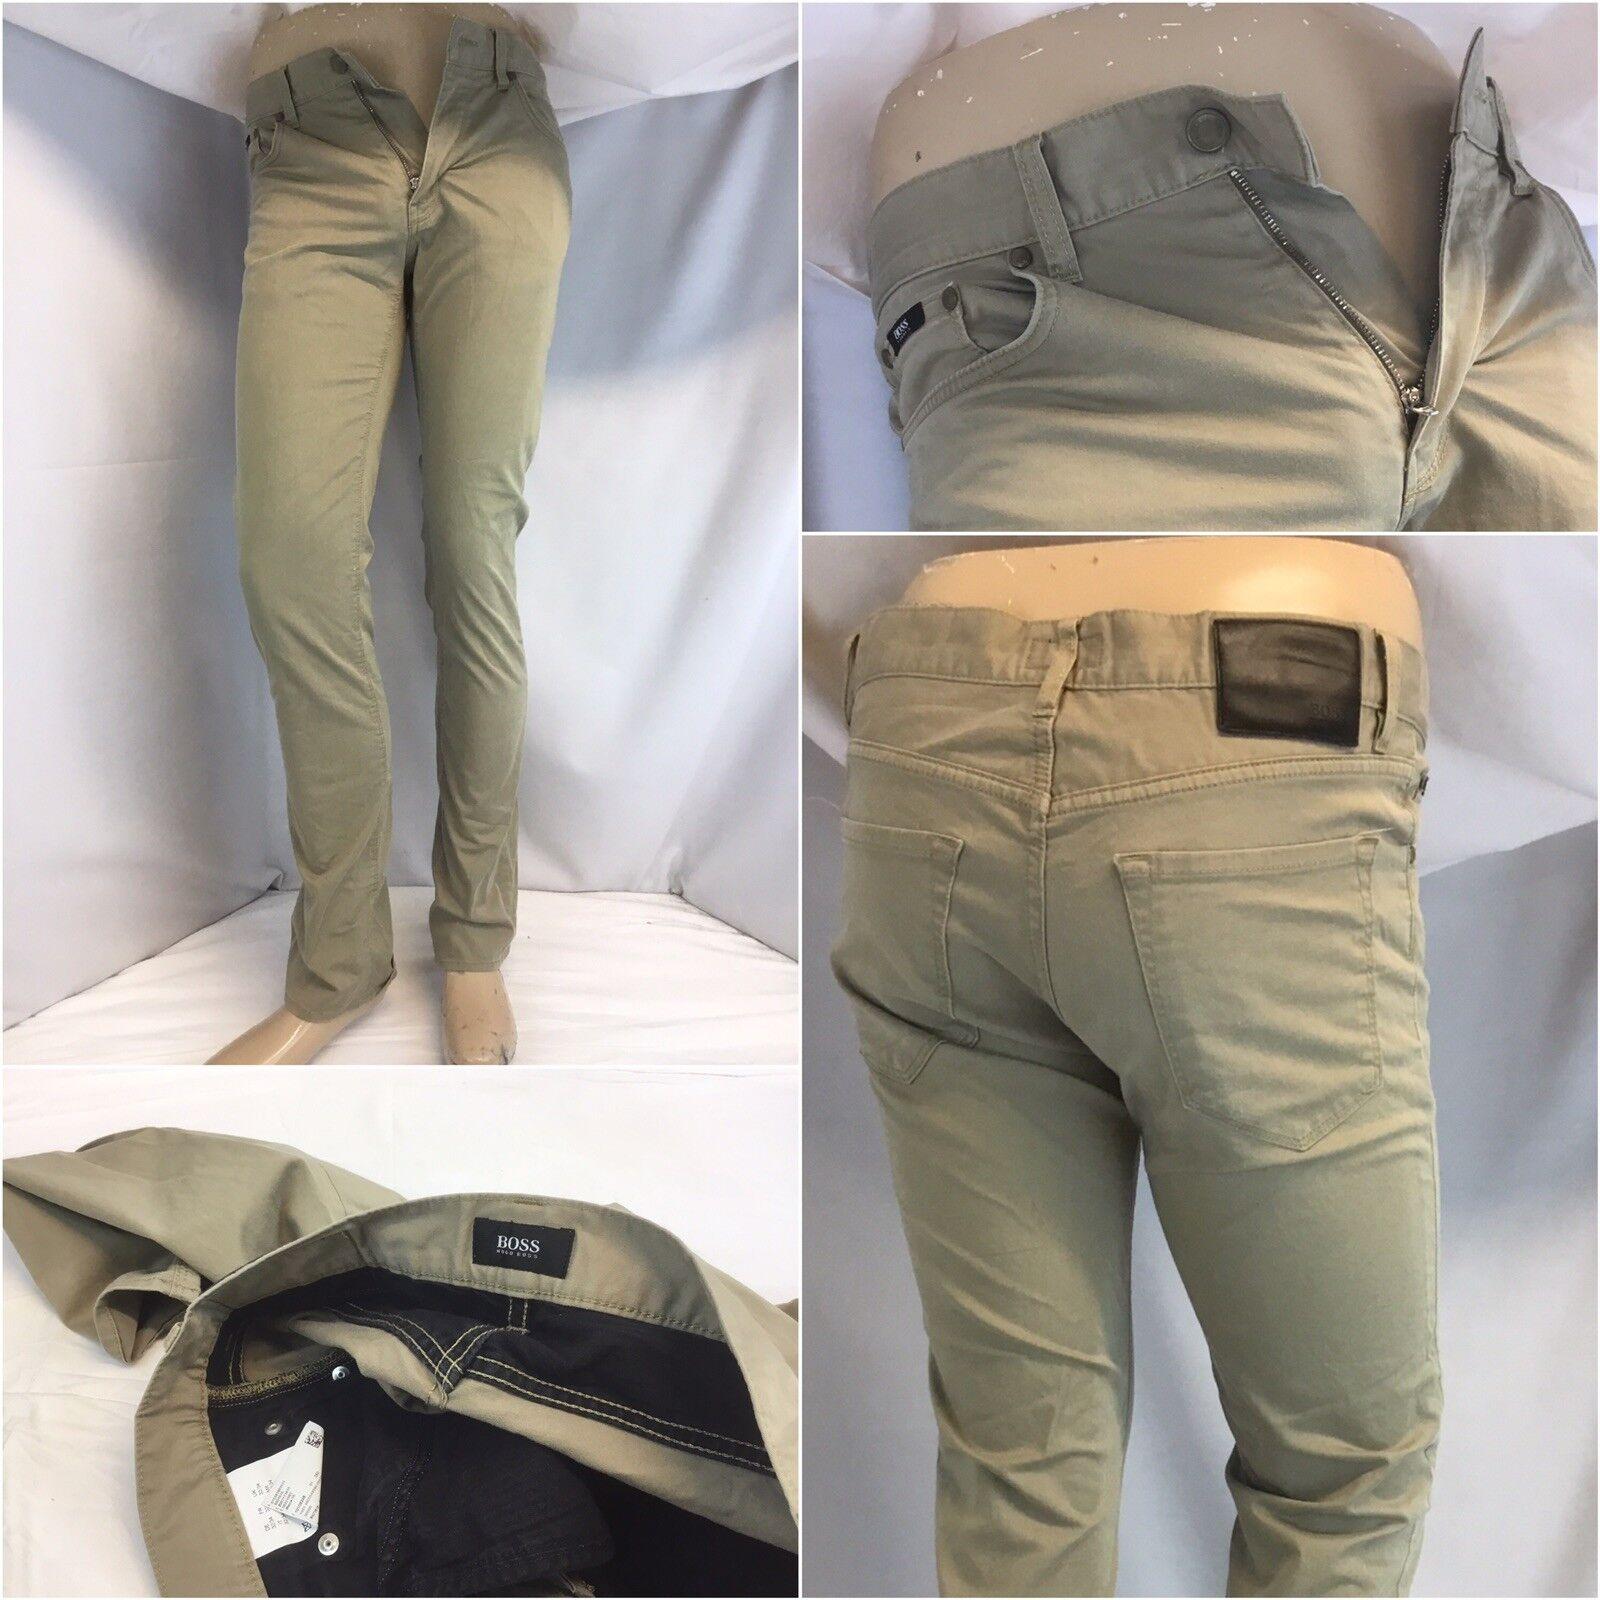 Hugo Boss Pants 32x32 Tan Cotton Lycra Flat Front Maine R Fit Romania YGI RE1050